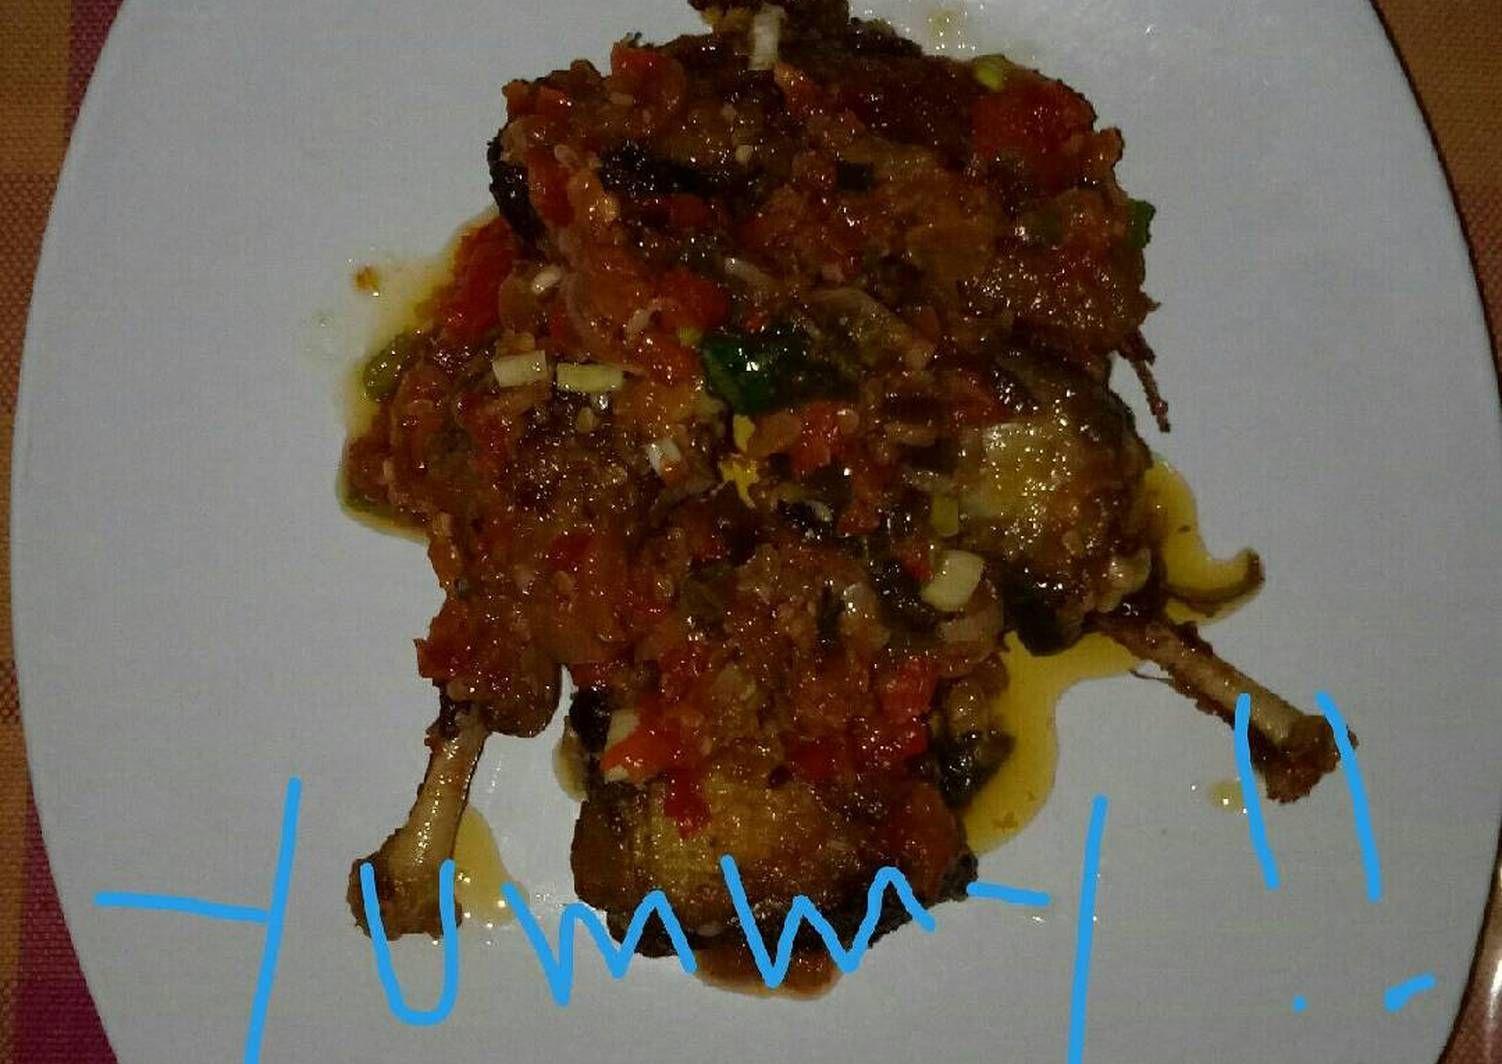 Resep Rica Mentog Oleh Lolaa Resep Resep Ide Makanan Resep Babi